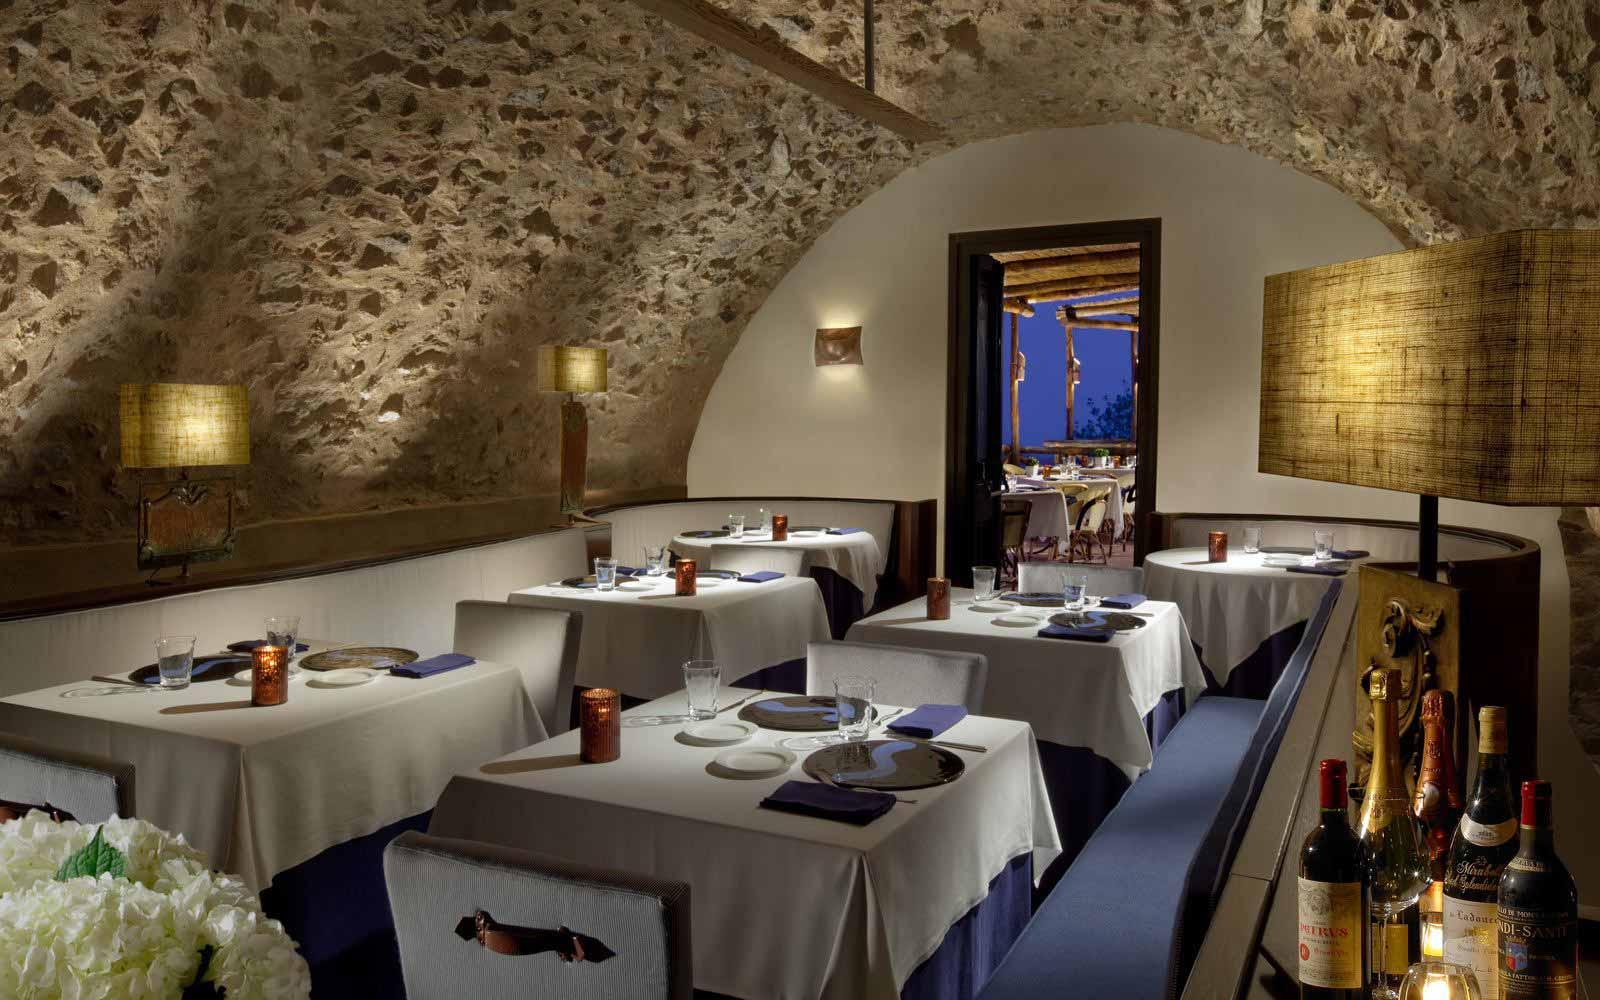 Restaurant at Monastero Santa Rosa